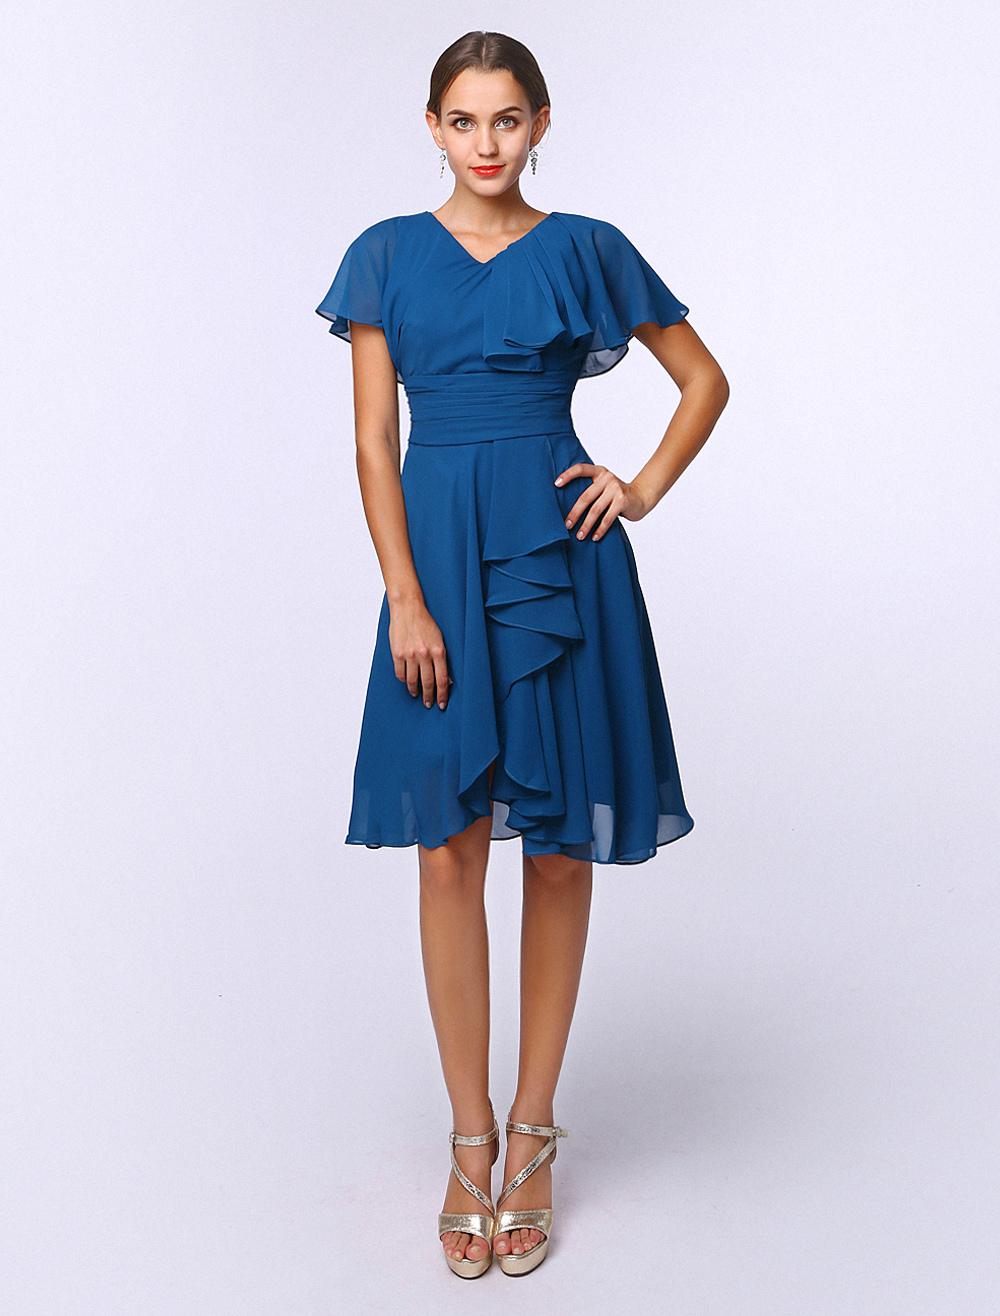 Glamour Royal Blue A-line V-Neck Cascading Ruffle Short Sleeves Chiffon Bridal Mother Dress (Wedding) photo